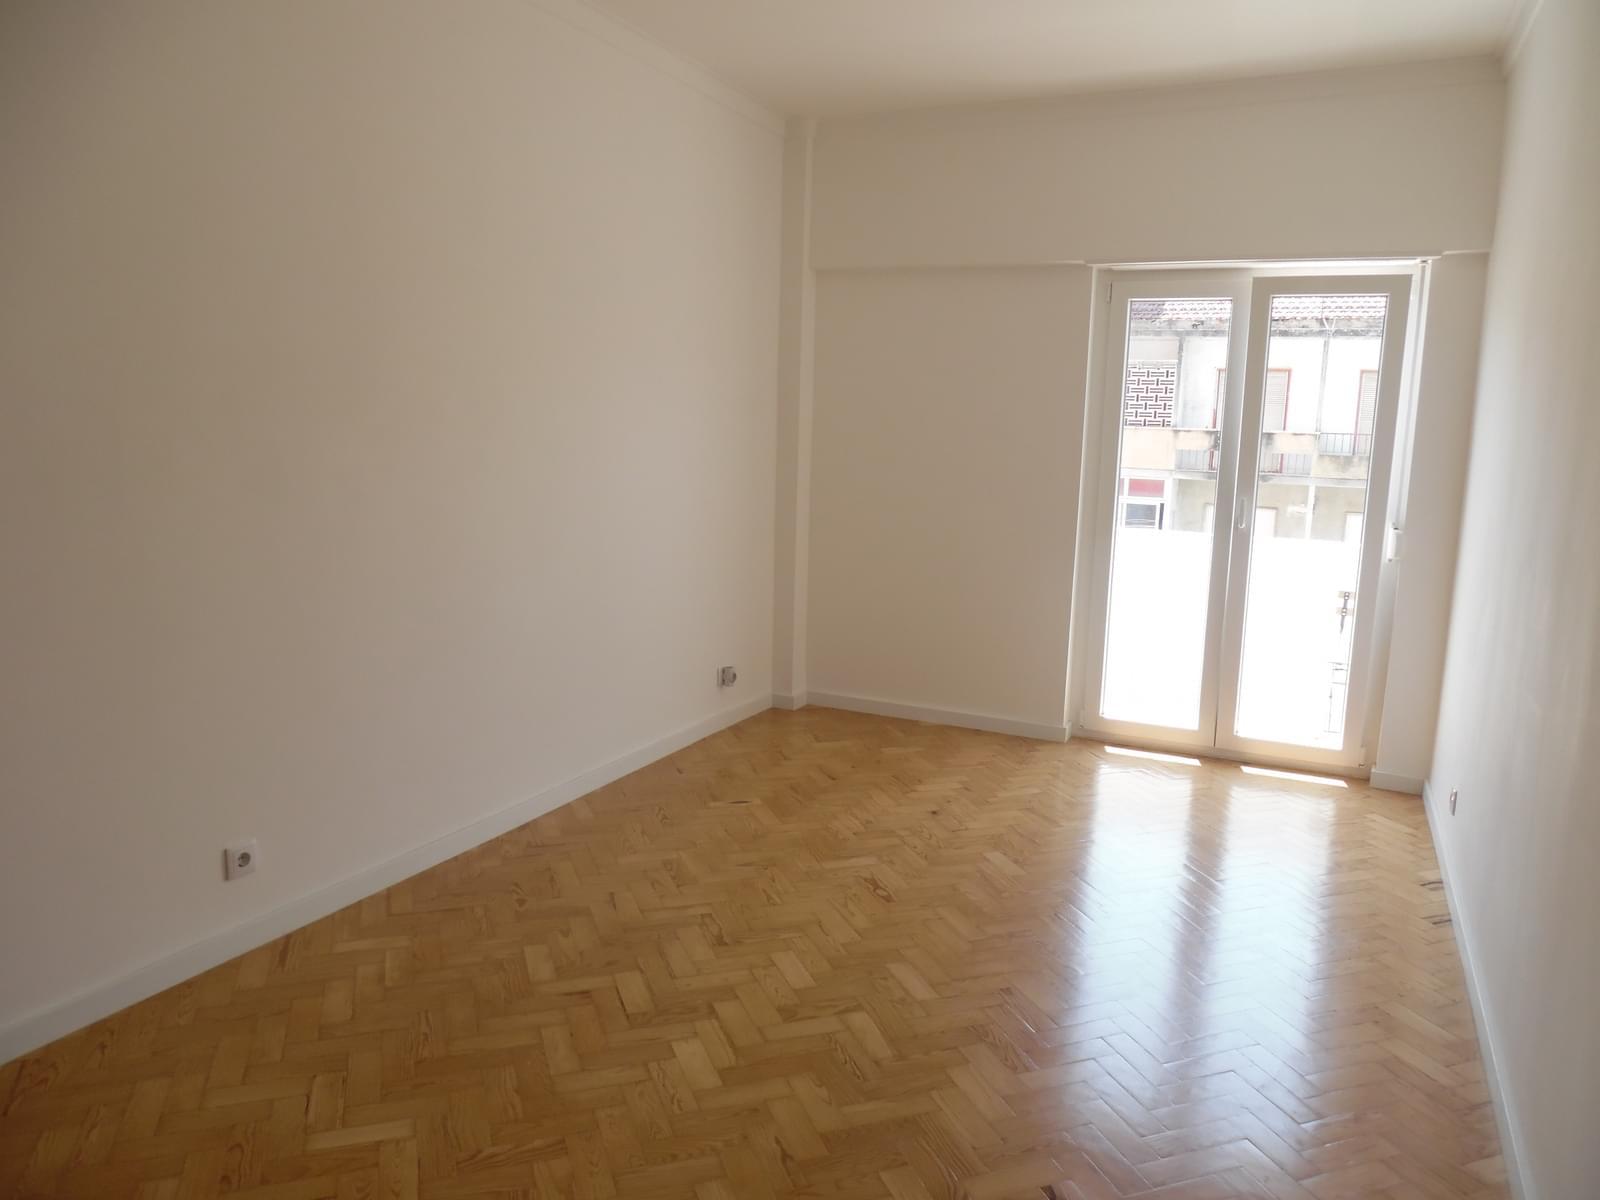 pf17256-apartamento-t2-lisboa-1a7da1d9-f36a-446a-817e-2f4f7fb82a9f